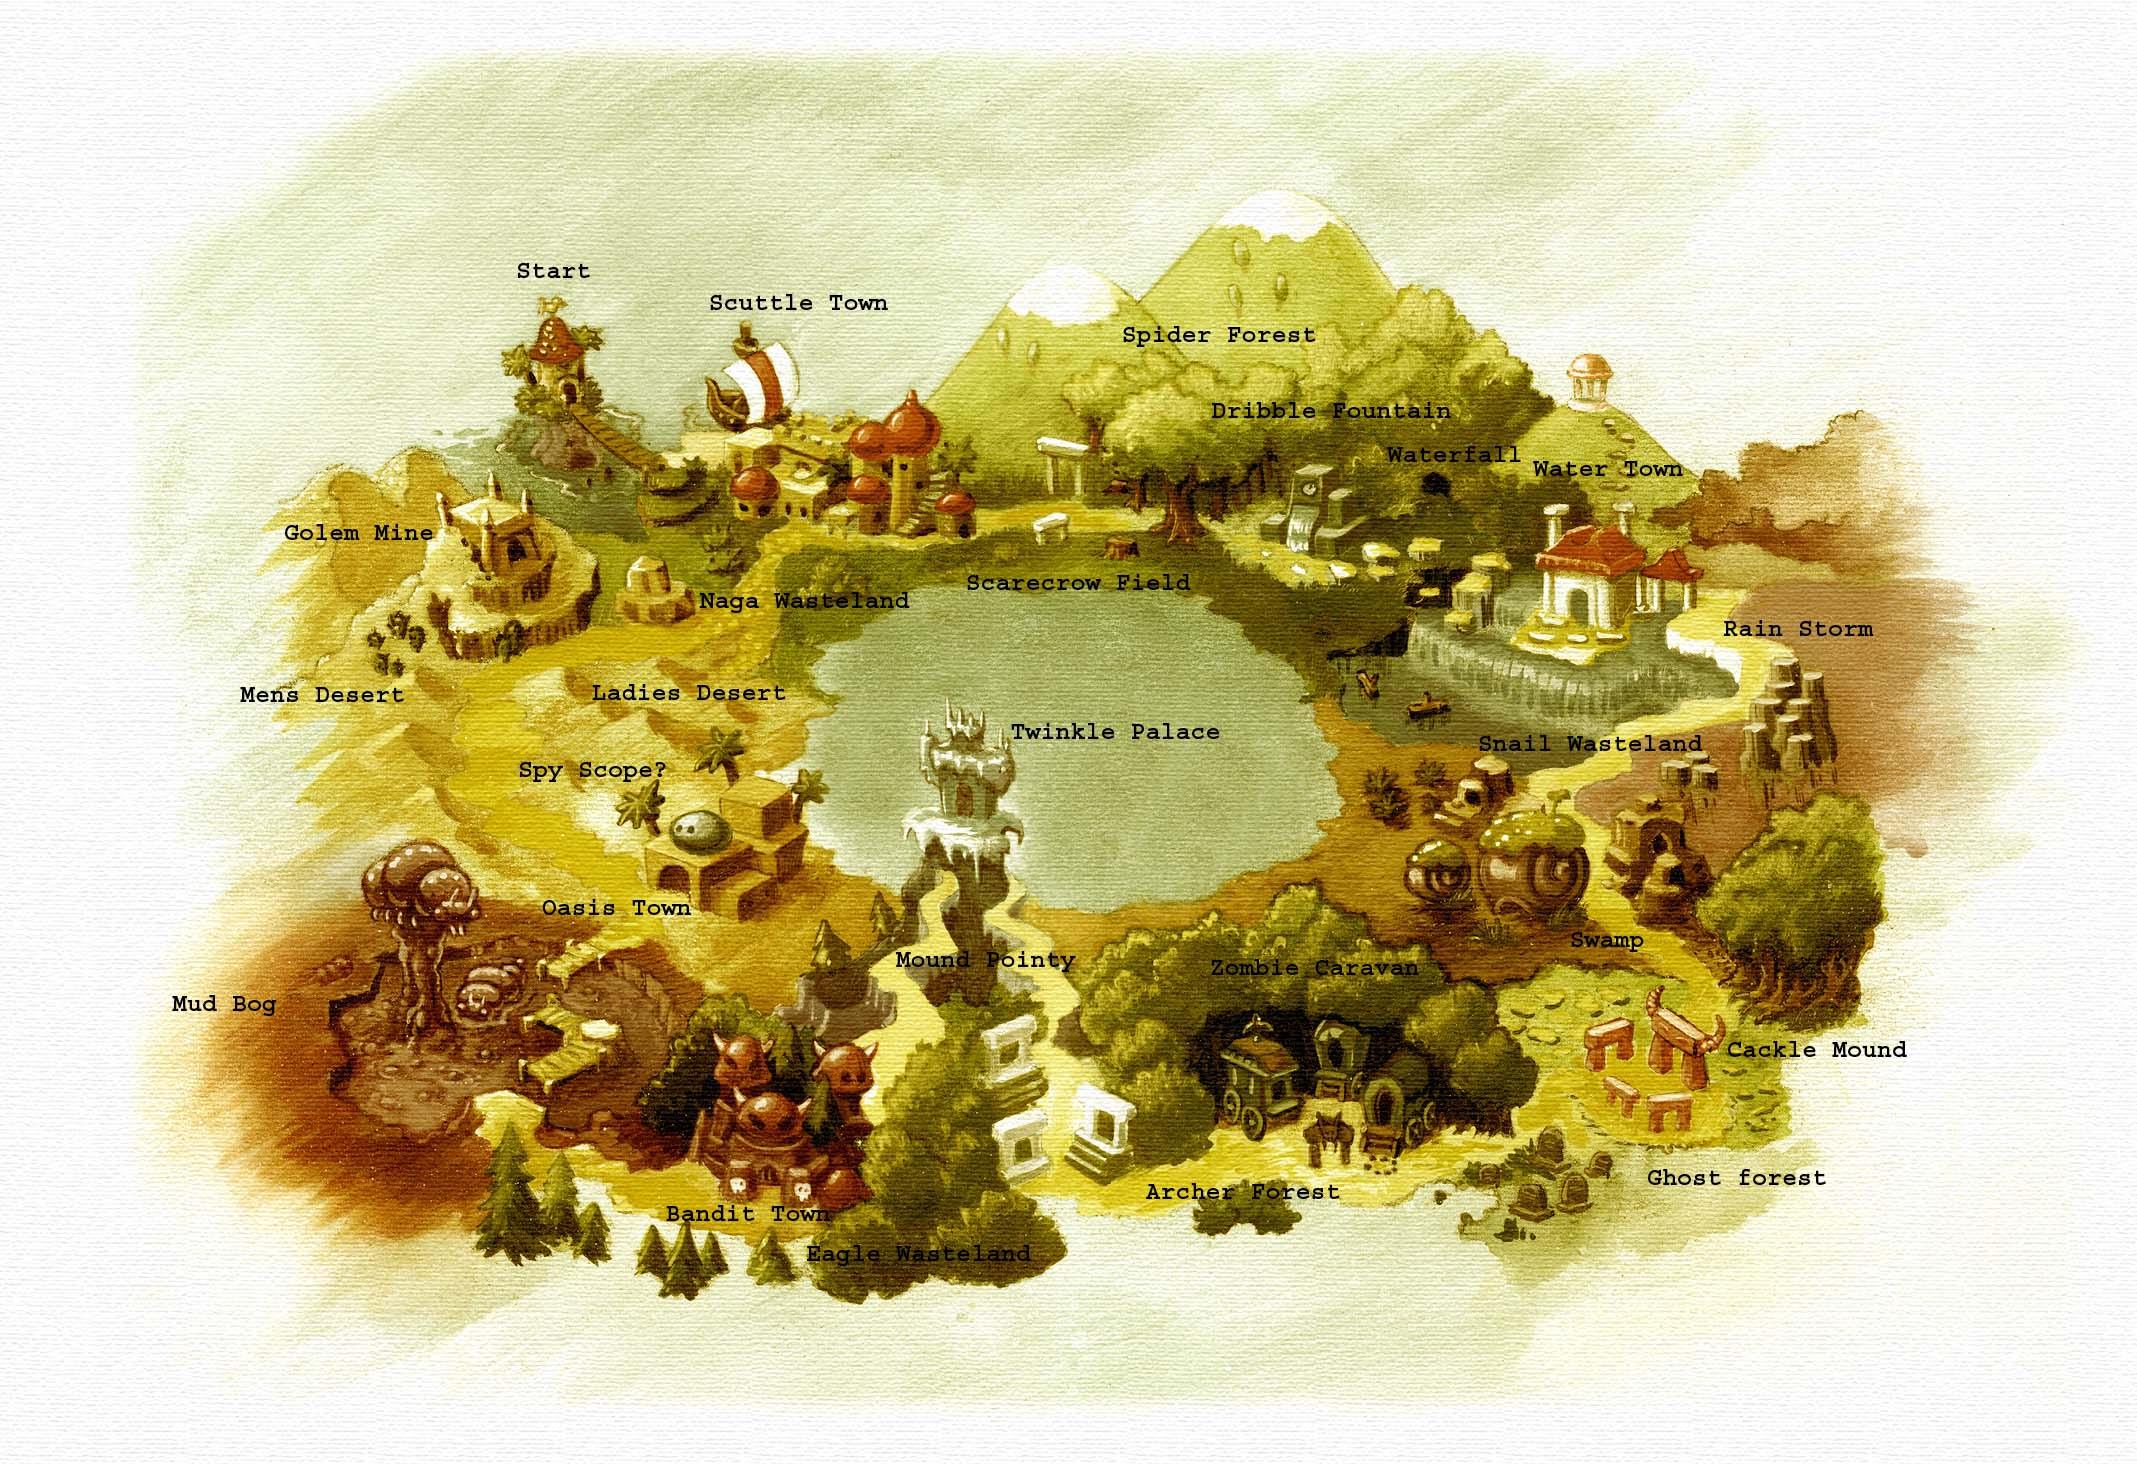 Shantae Overworld Map Sequin Land